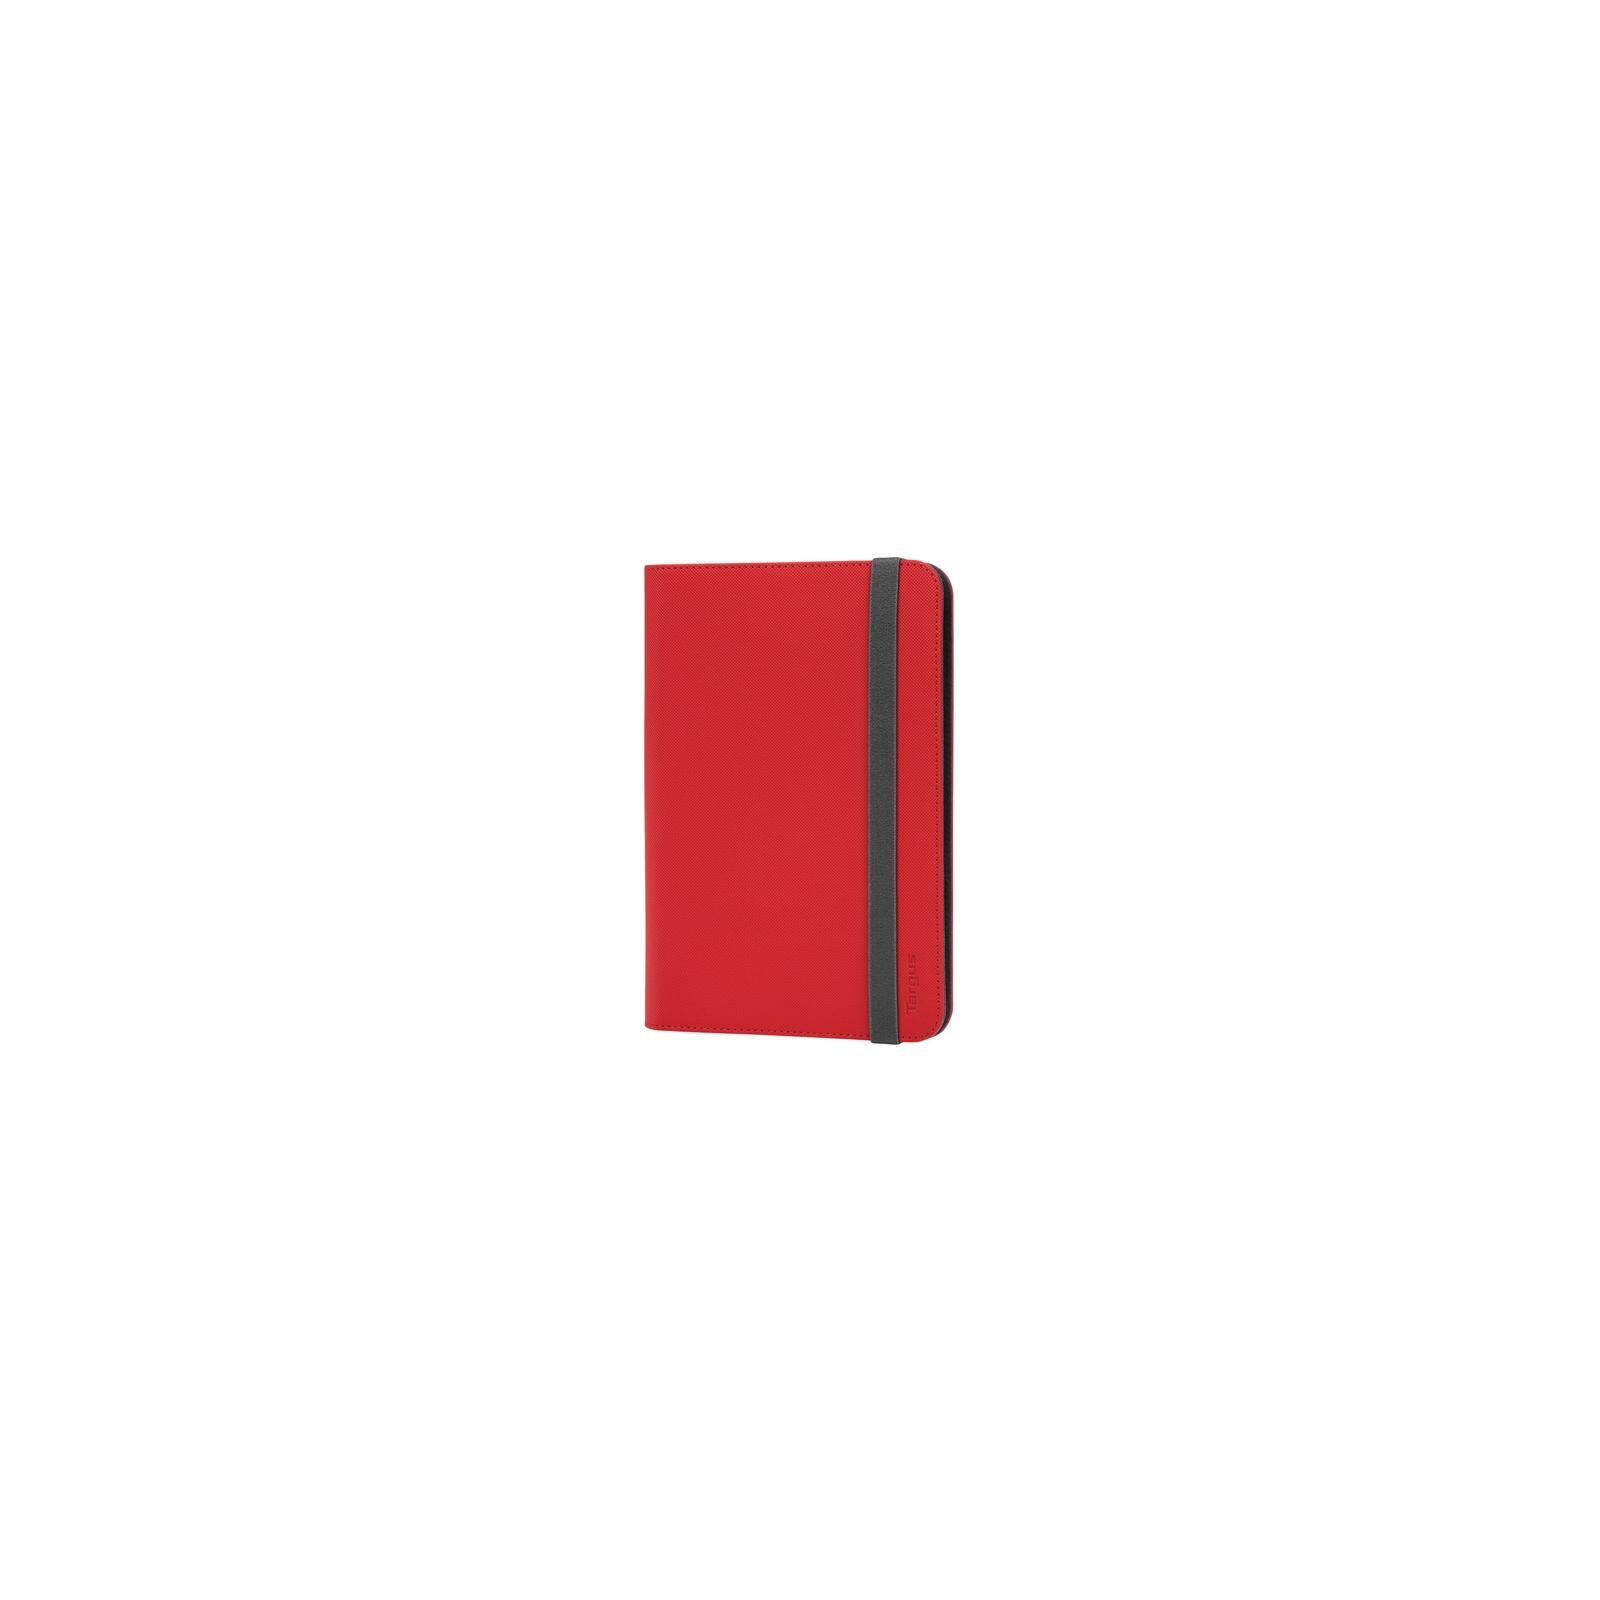 "Чехол для планшета Targus 7-8"" Universal RED stand (THZ33301EU) изображение 4"